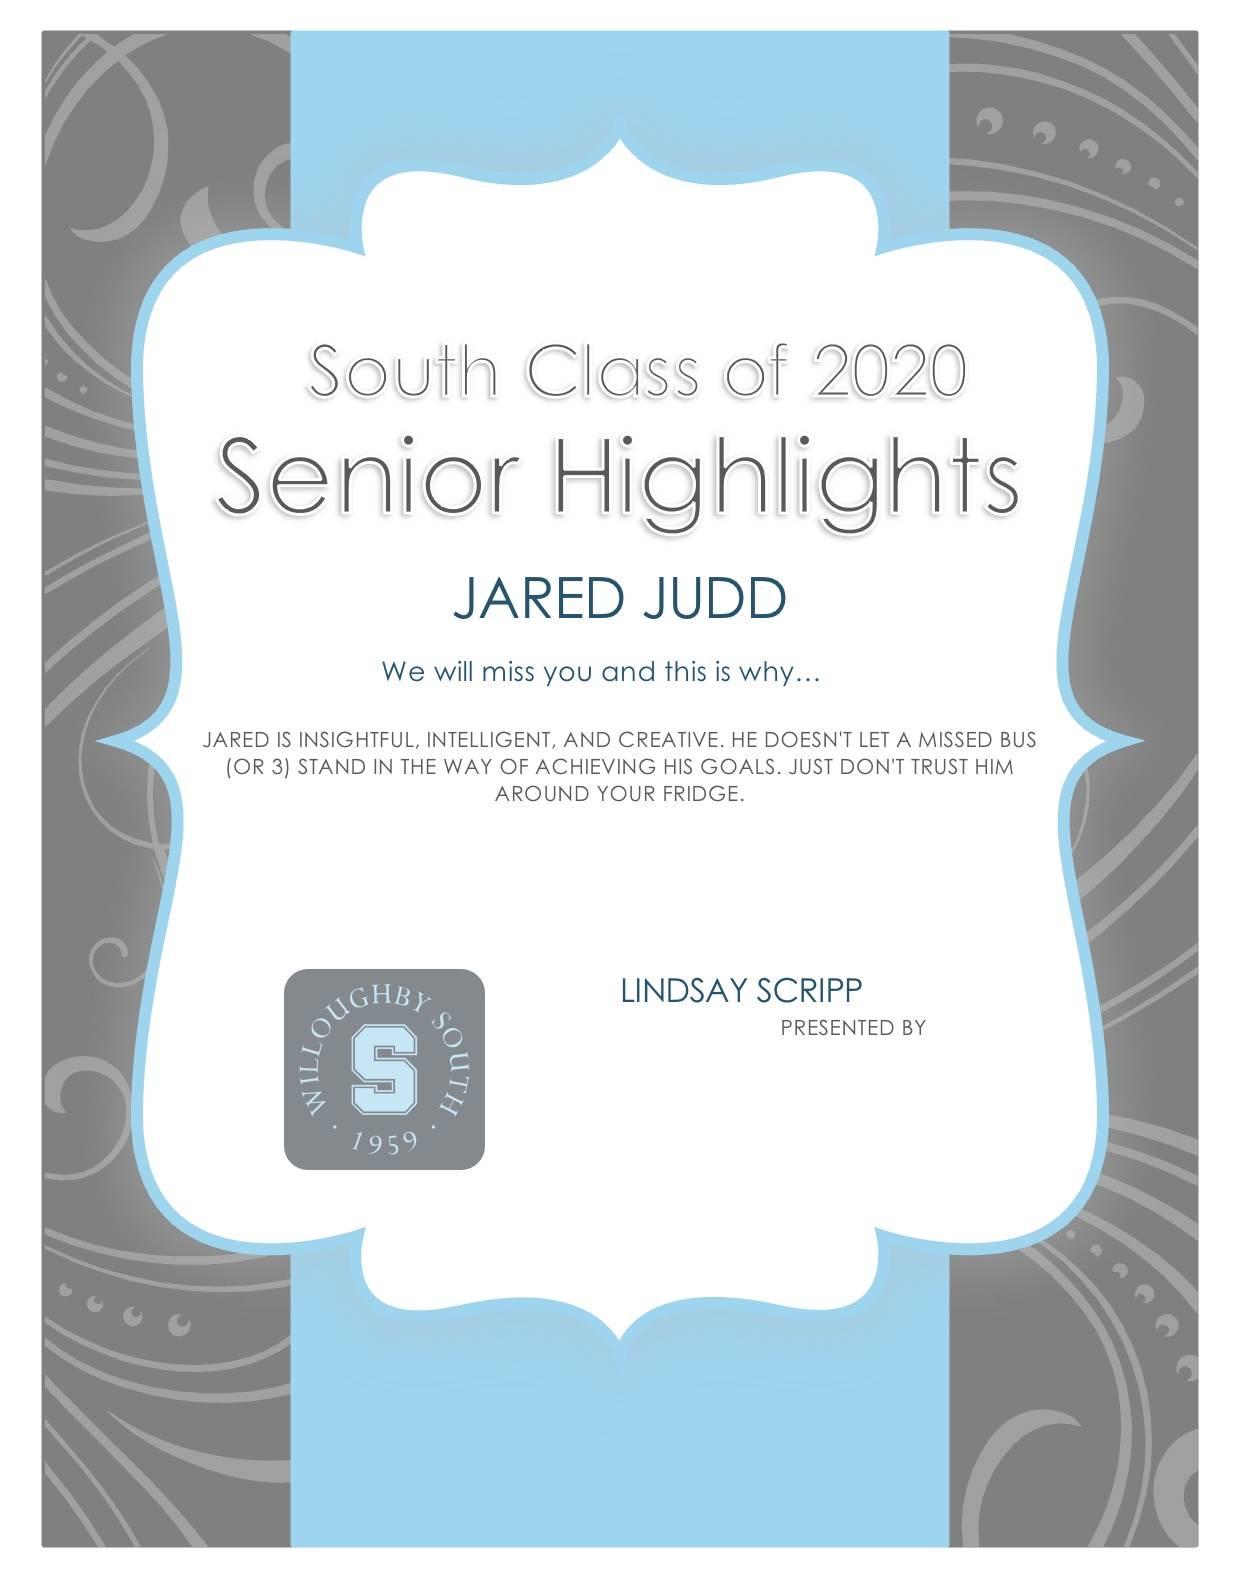 Jared Judd